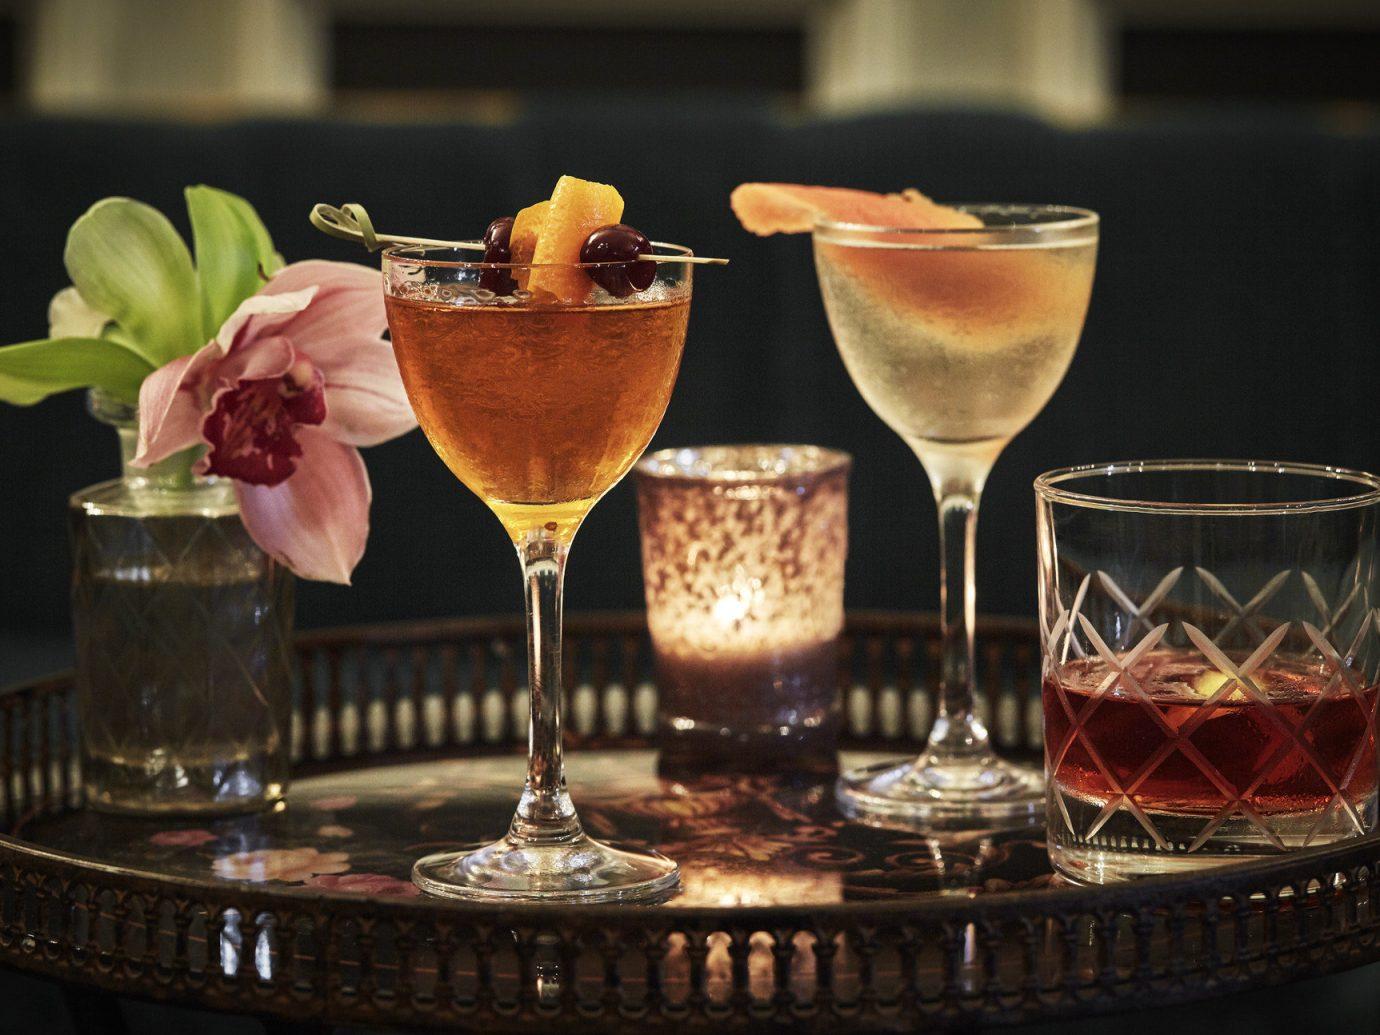 Trip Ideas indoor alcoholic beverage Drink cocktail wine restaurant distilled beverage meal